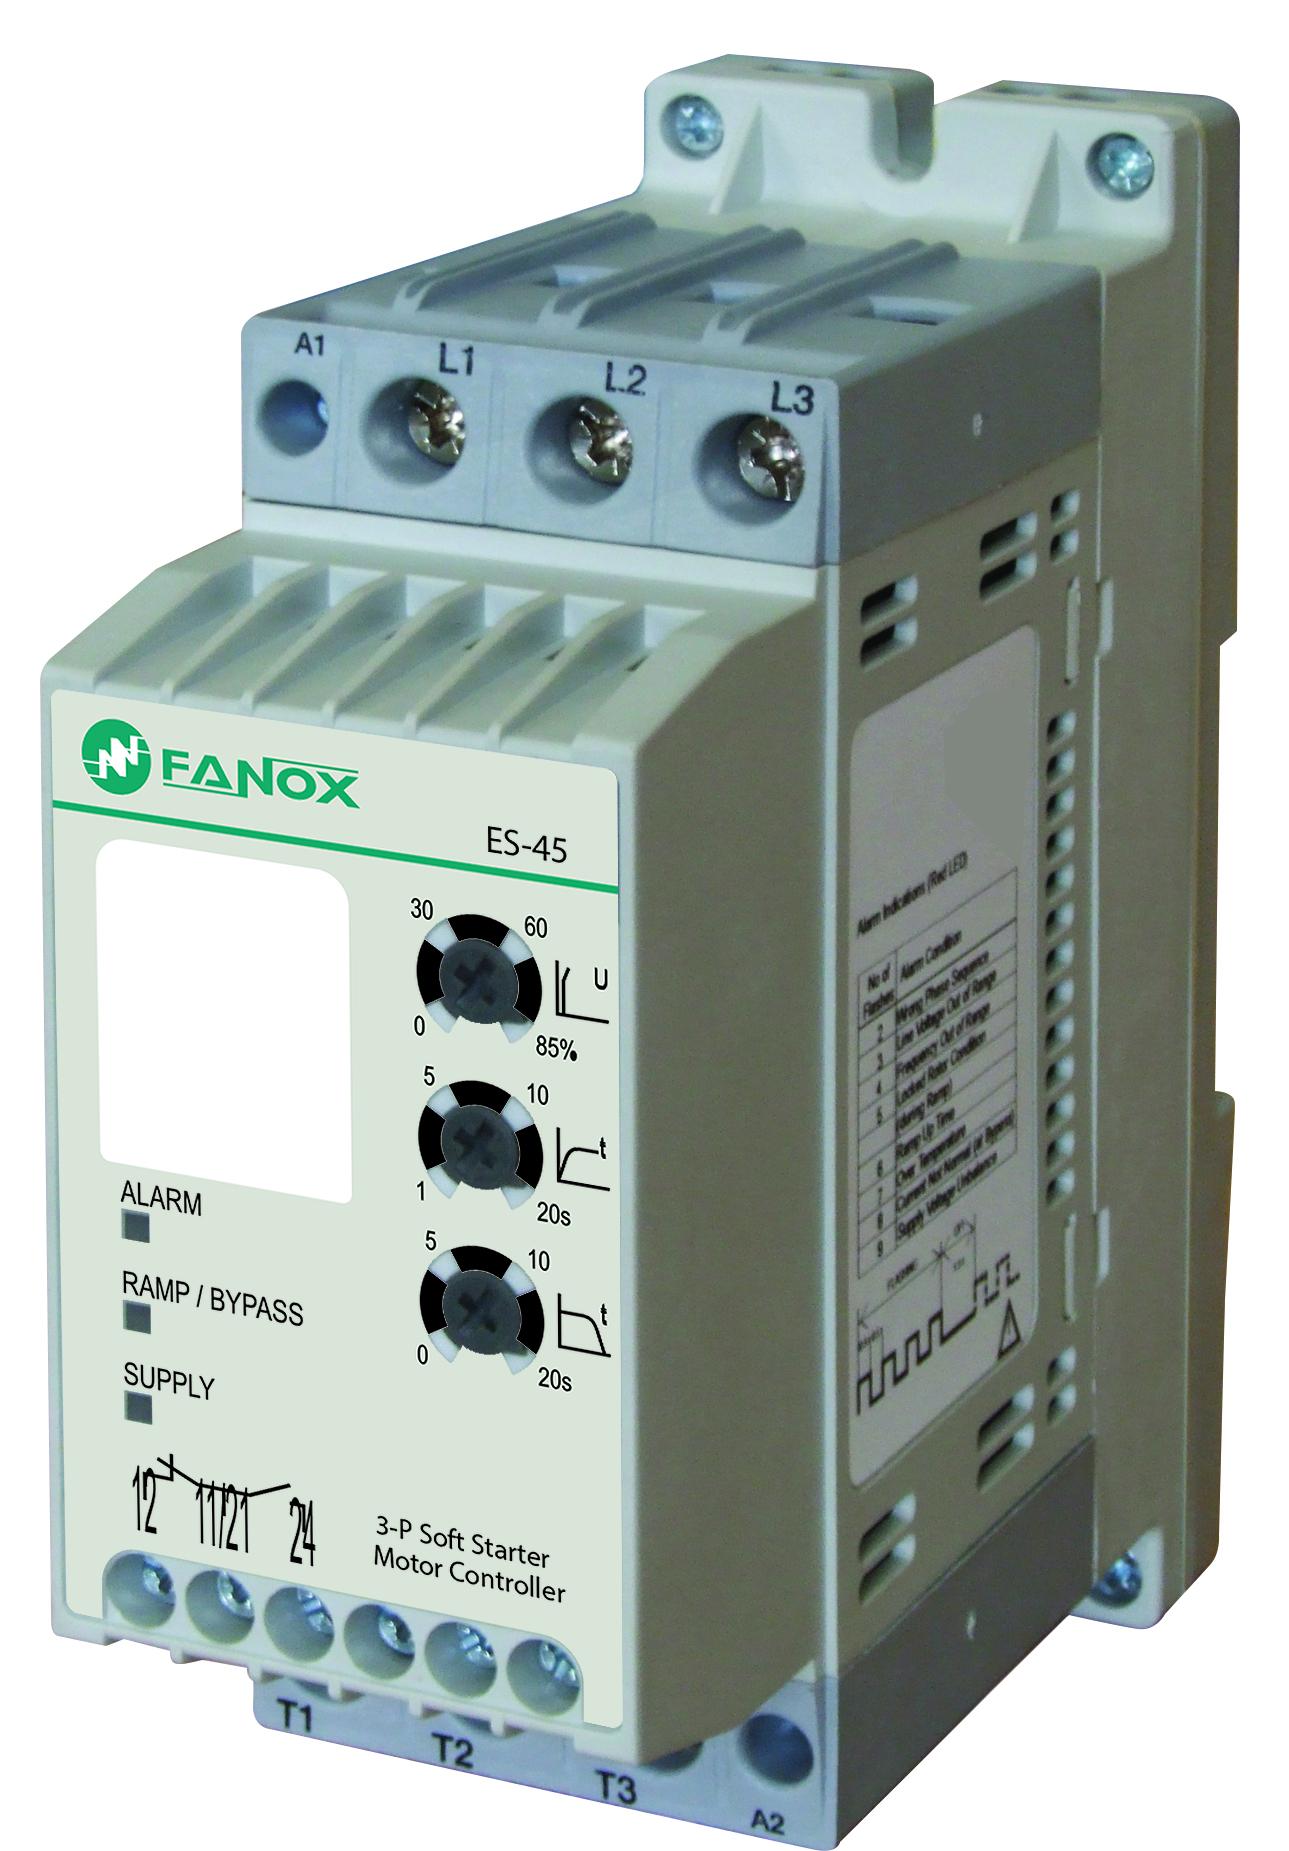 https://www.fanox.com/wp-content/uploads/jpg/ES-45-Fanox.jpg